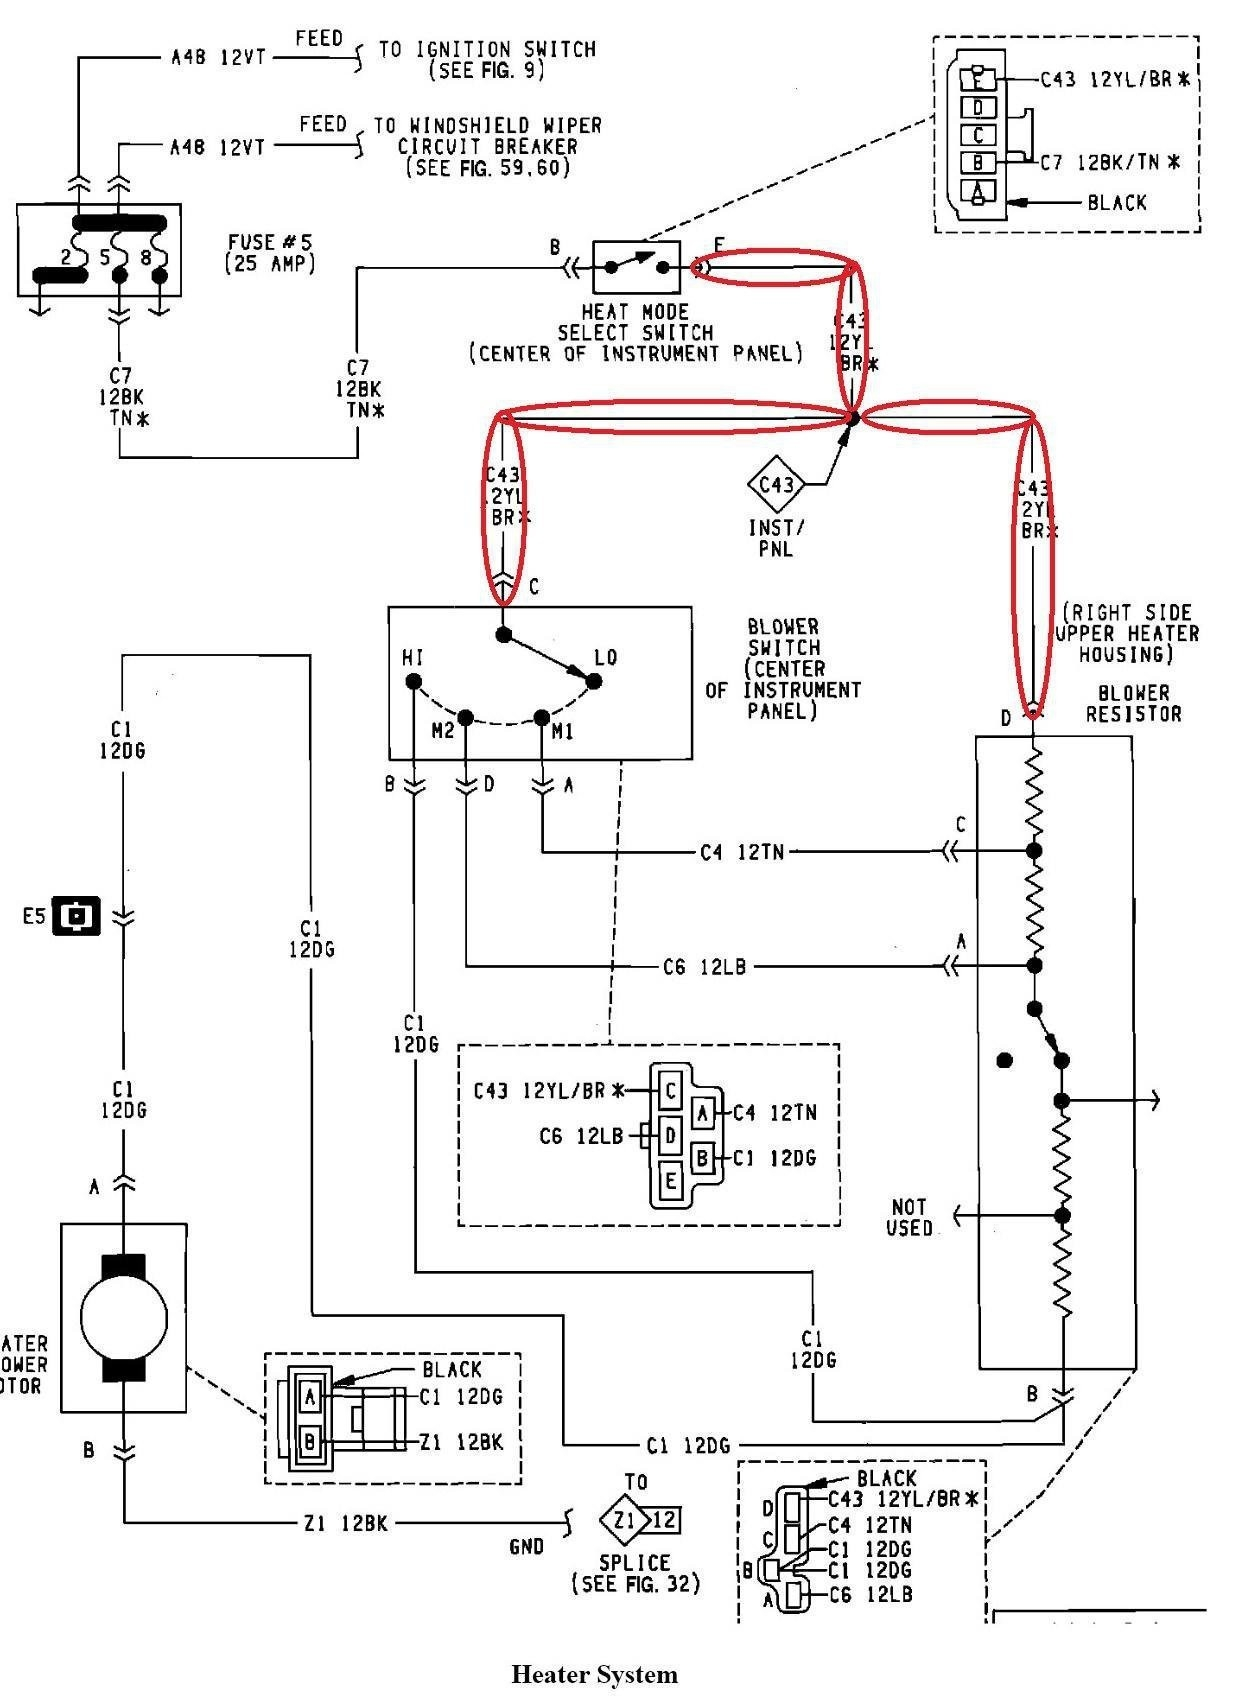 36 volt club car golf cart wiring diagram - ezgo txt 36 volt wiring diagram  new